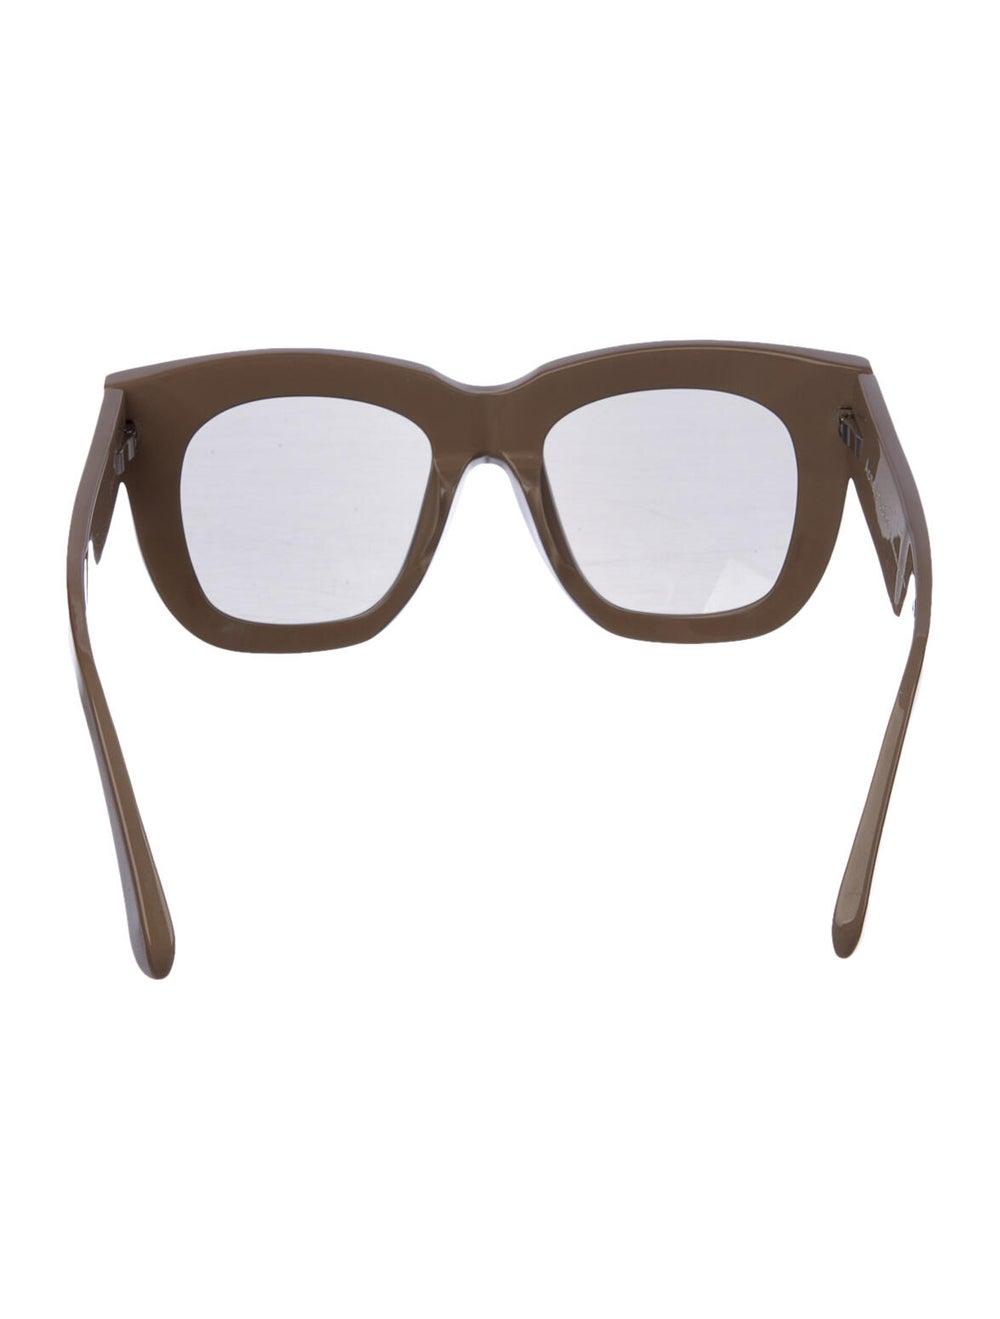 Acne Studios Square Mirrored Sunglasses - image 3